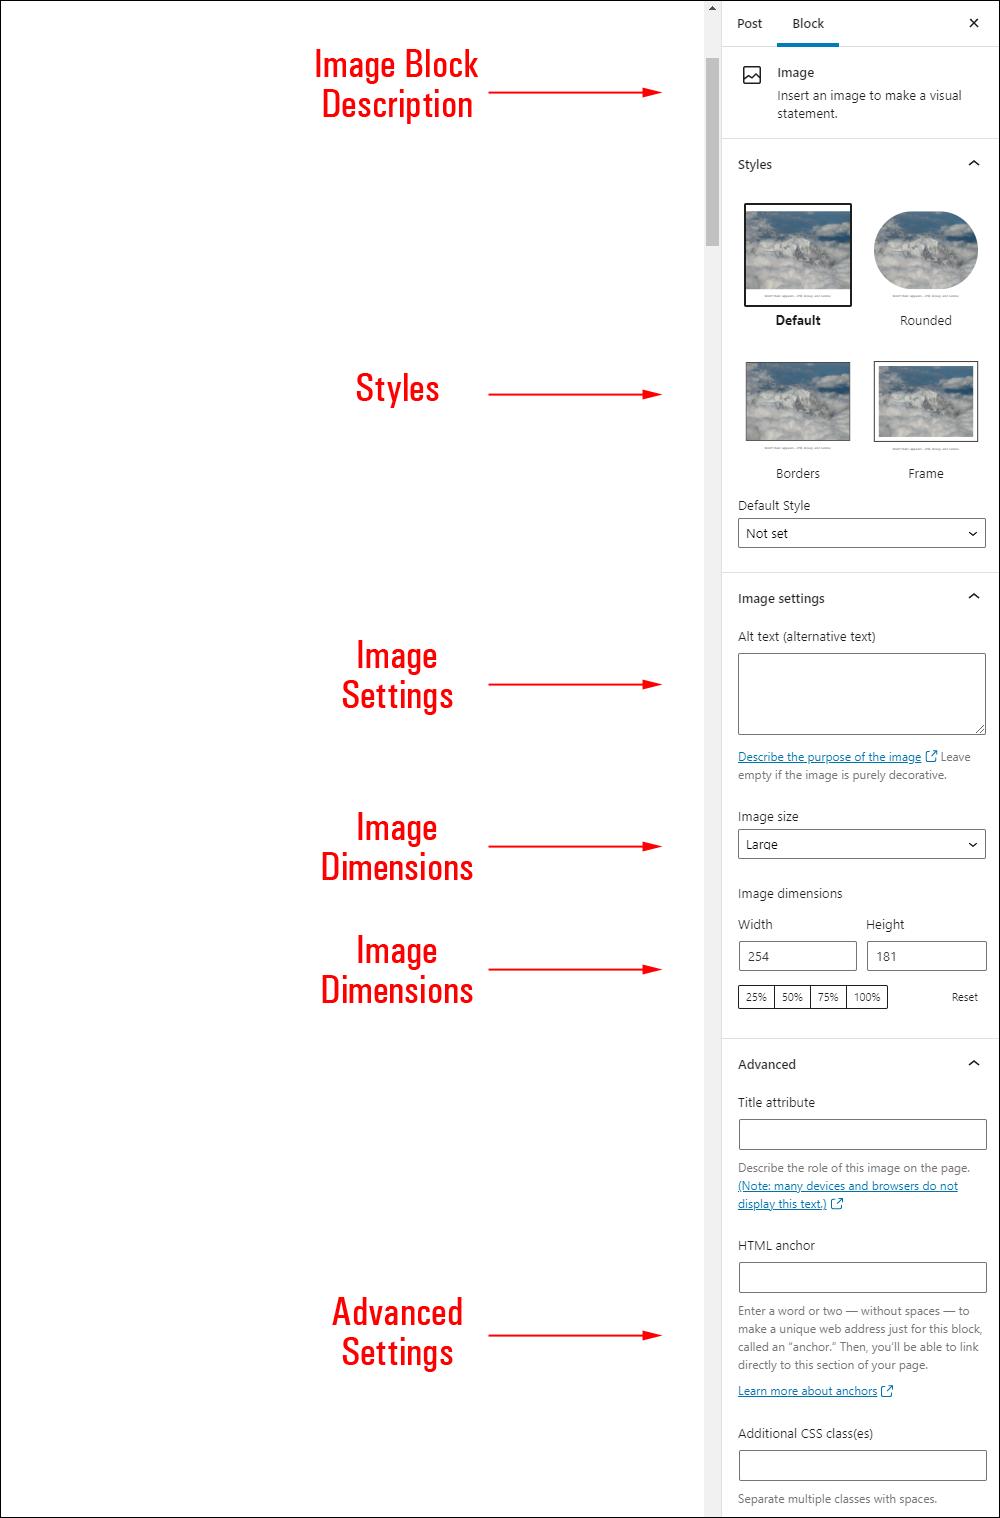 Image block settings.